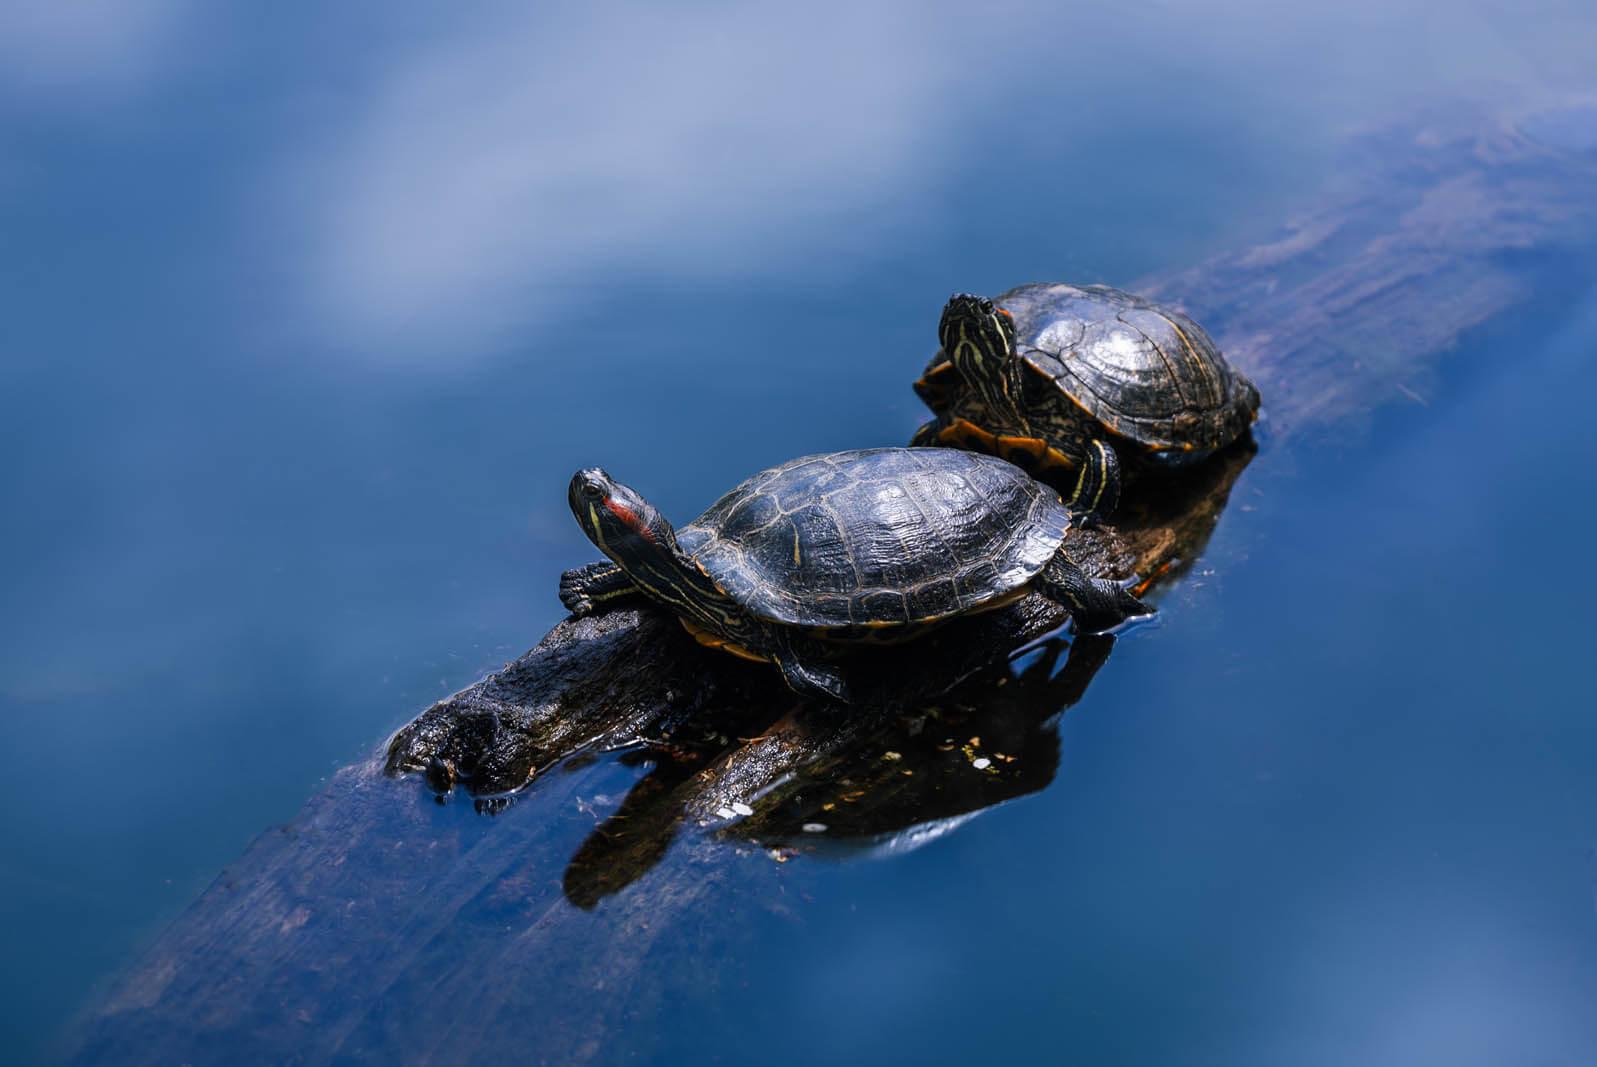 Turtles sunbathing in Prospect Park in Brooklyn